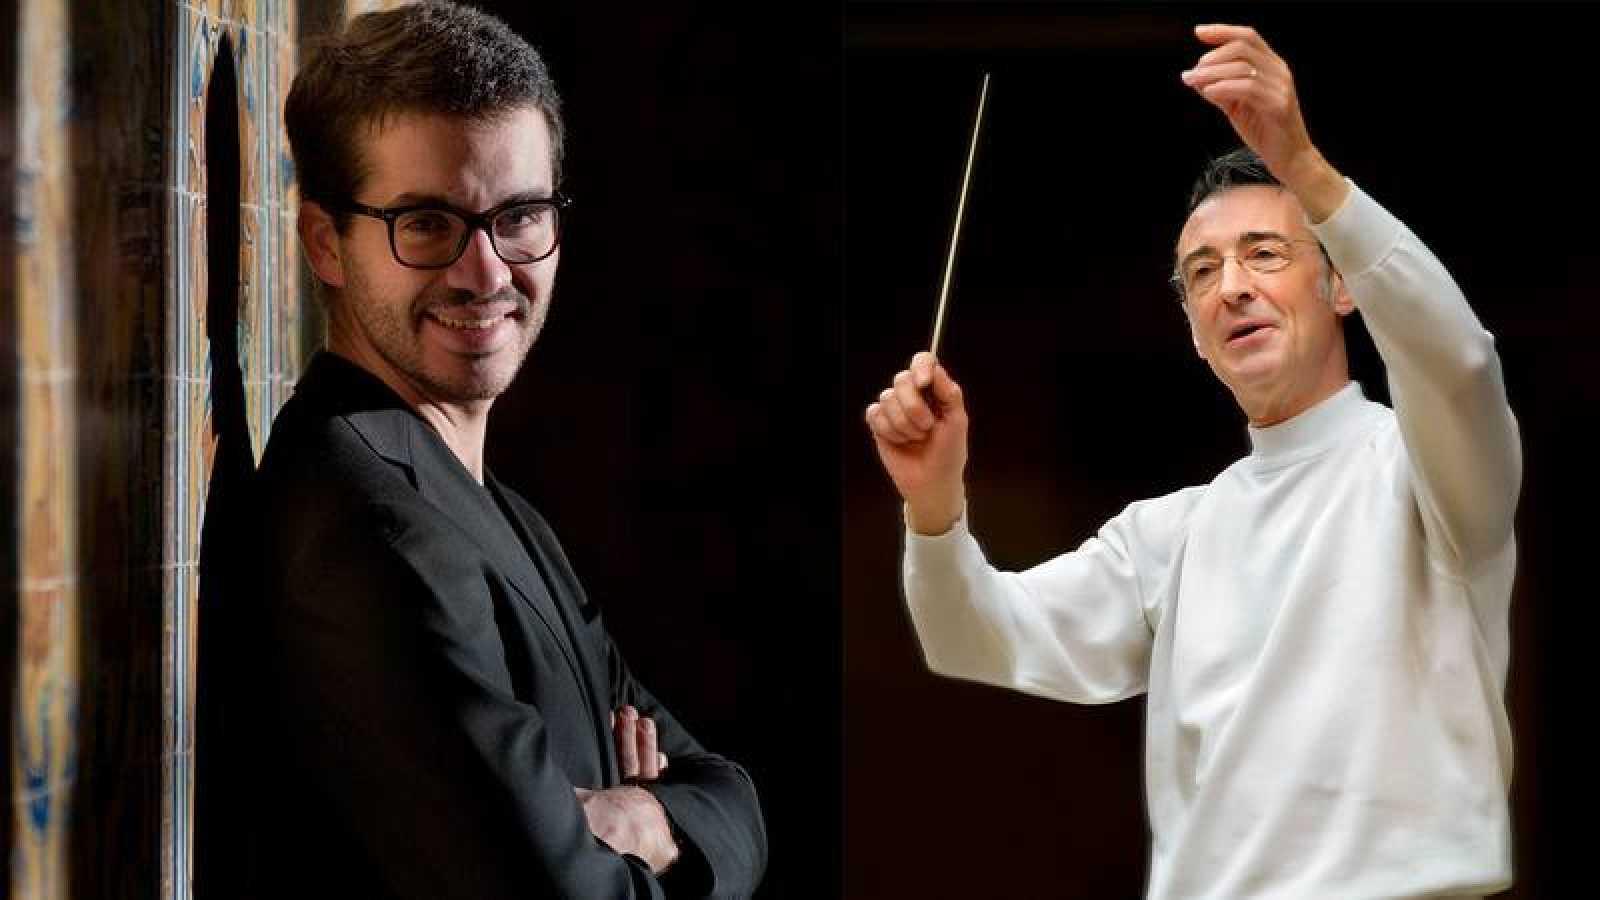 Juan Pérez Floristán y Miguel Ángel Gómez-Martínez